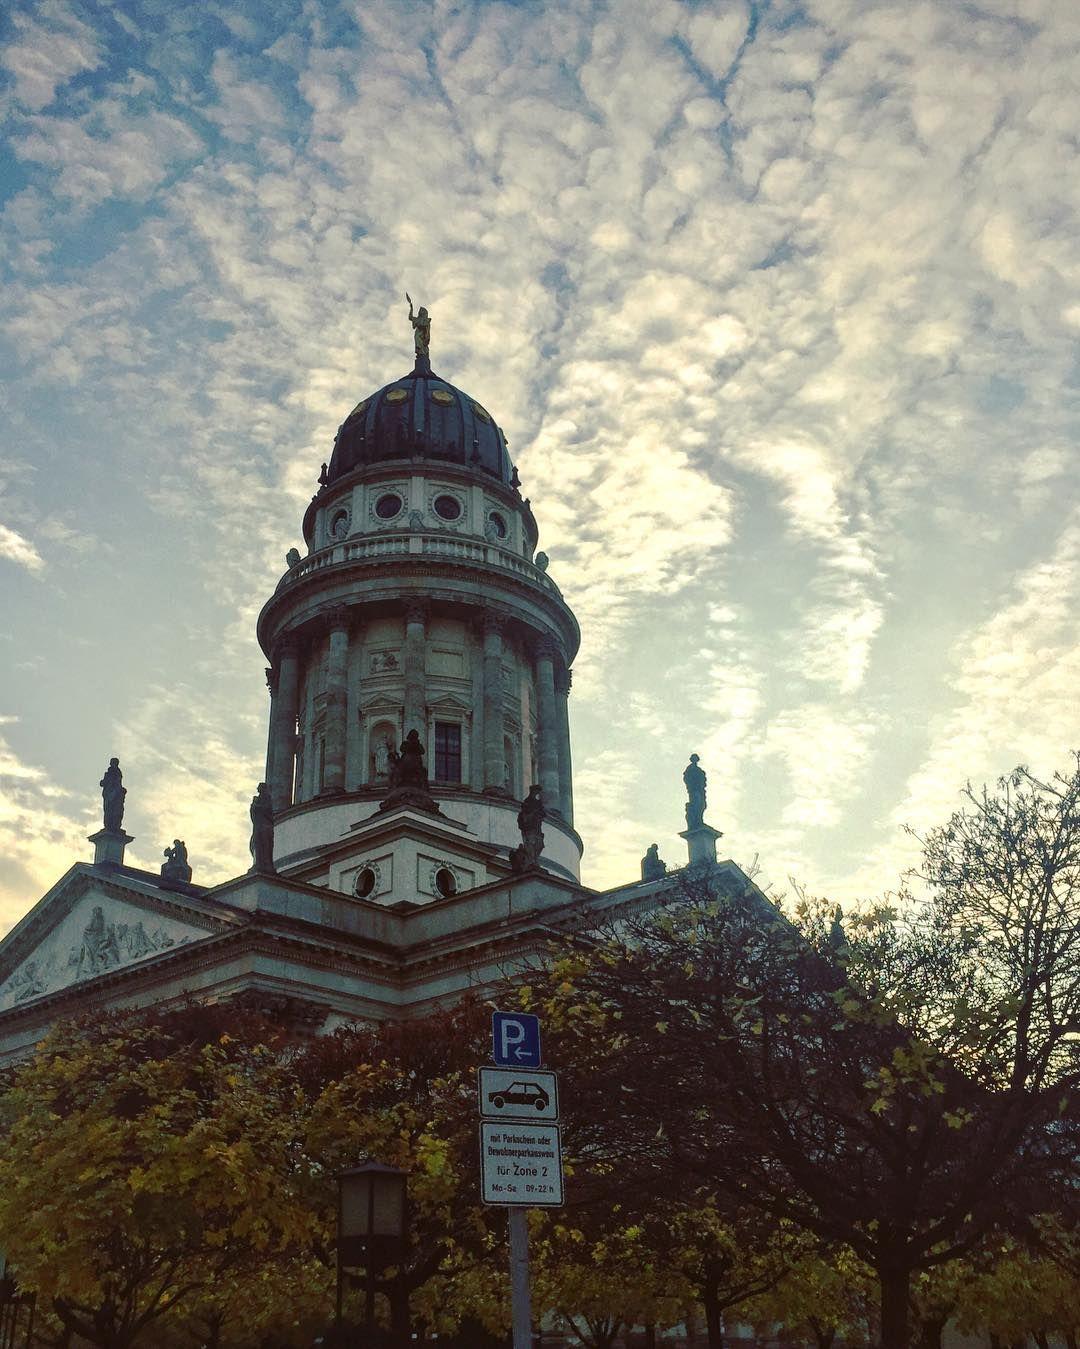 Gendarmenmarkt  #berlin #igersberlin #igersgermany #architexture #clouds #architecture #archidaily #sky #photooftheday #instadaily #instagood #amazing #beautiful #bestoftheday #art #igtravel #all_shots #mytravelgram #travel #traveling #visiting #instatravel #instago #trip #travelling #tourism #instapassport #instatraveling #travelgram #travelingram